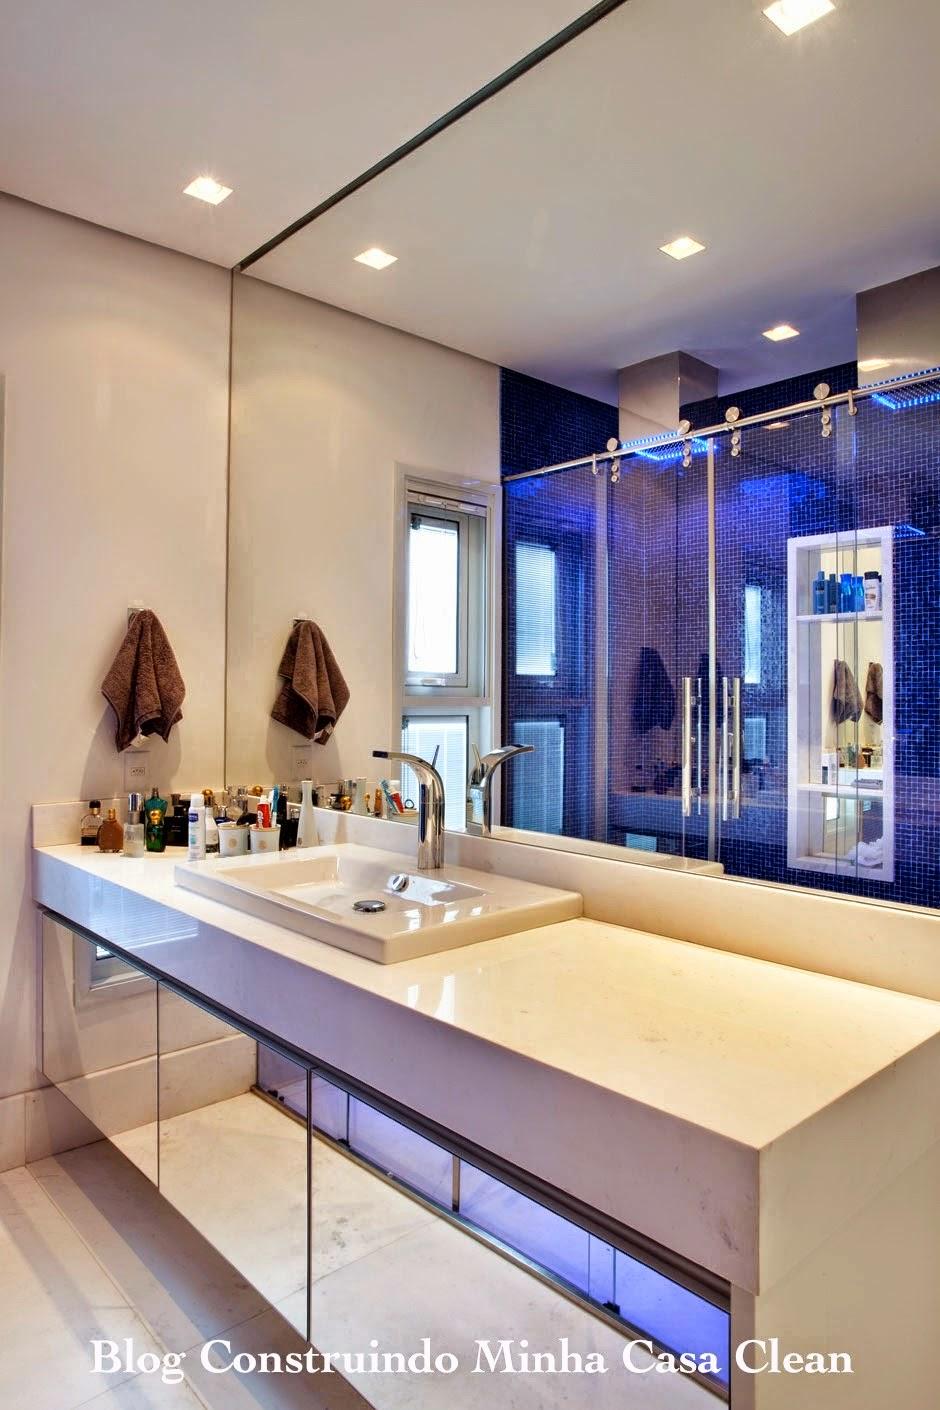 Construindo Minha Casa Clean Top 10 Banheiros Modernos Pequenos e Grandes p -> Banheiros Modernos Grandes